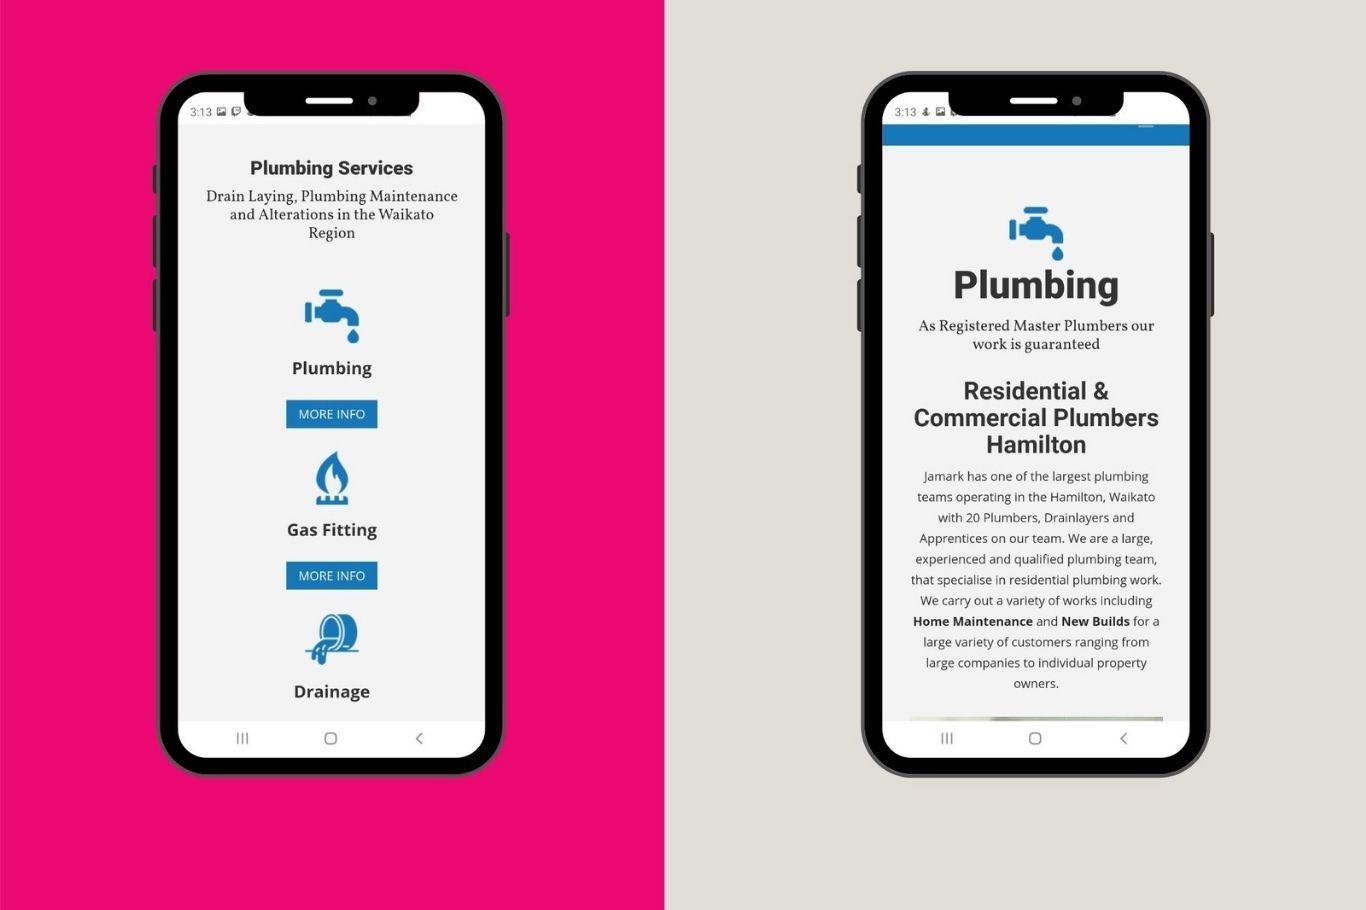 jamark plumbing mobile optimised website designing cloud media